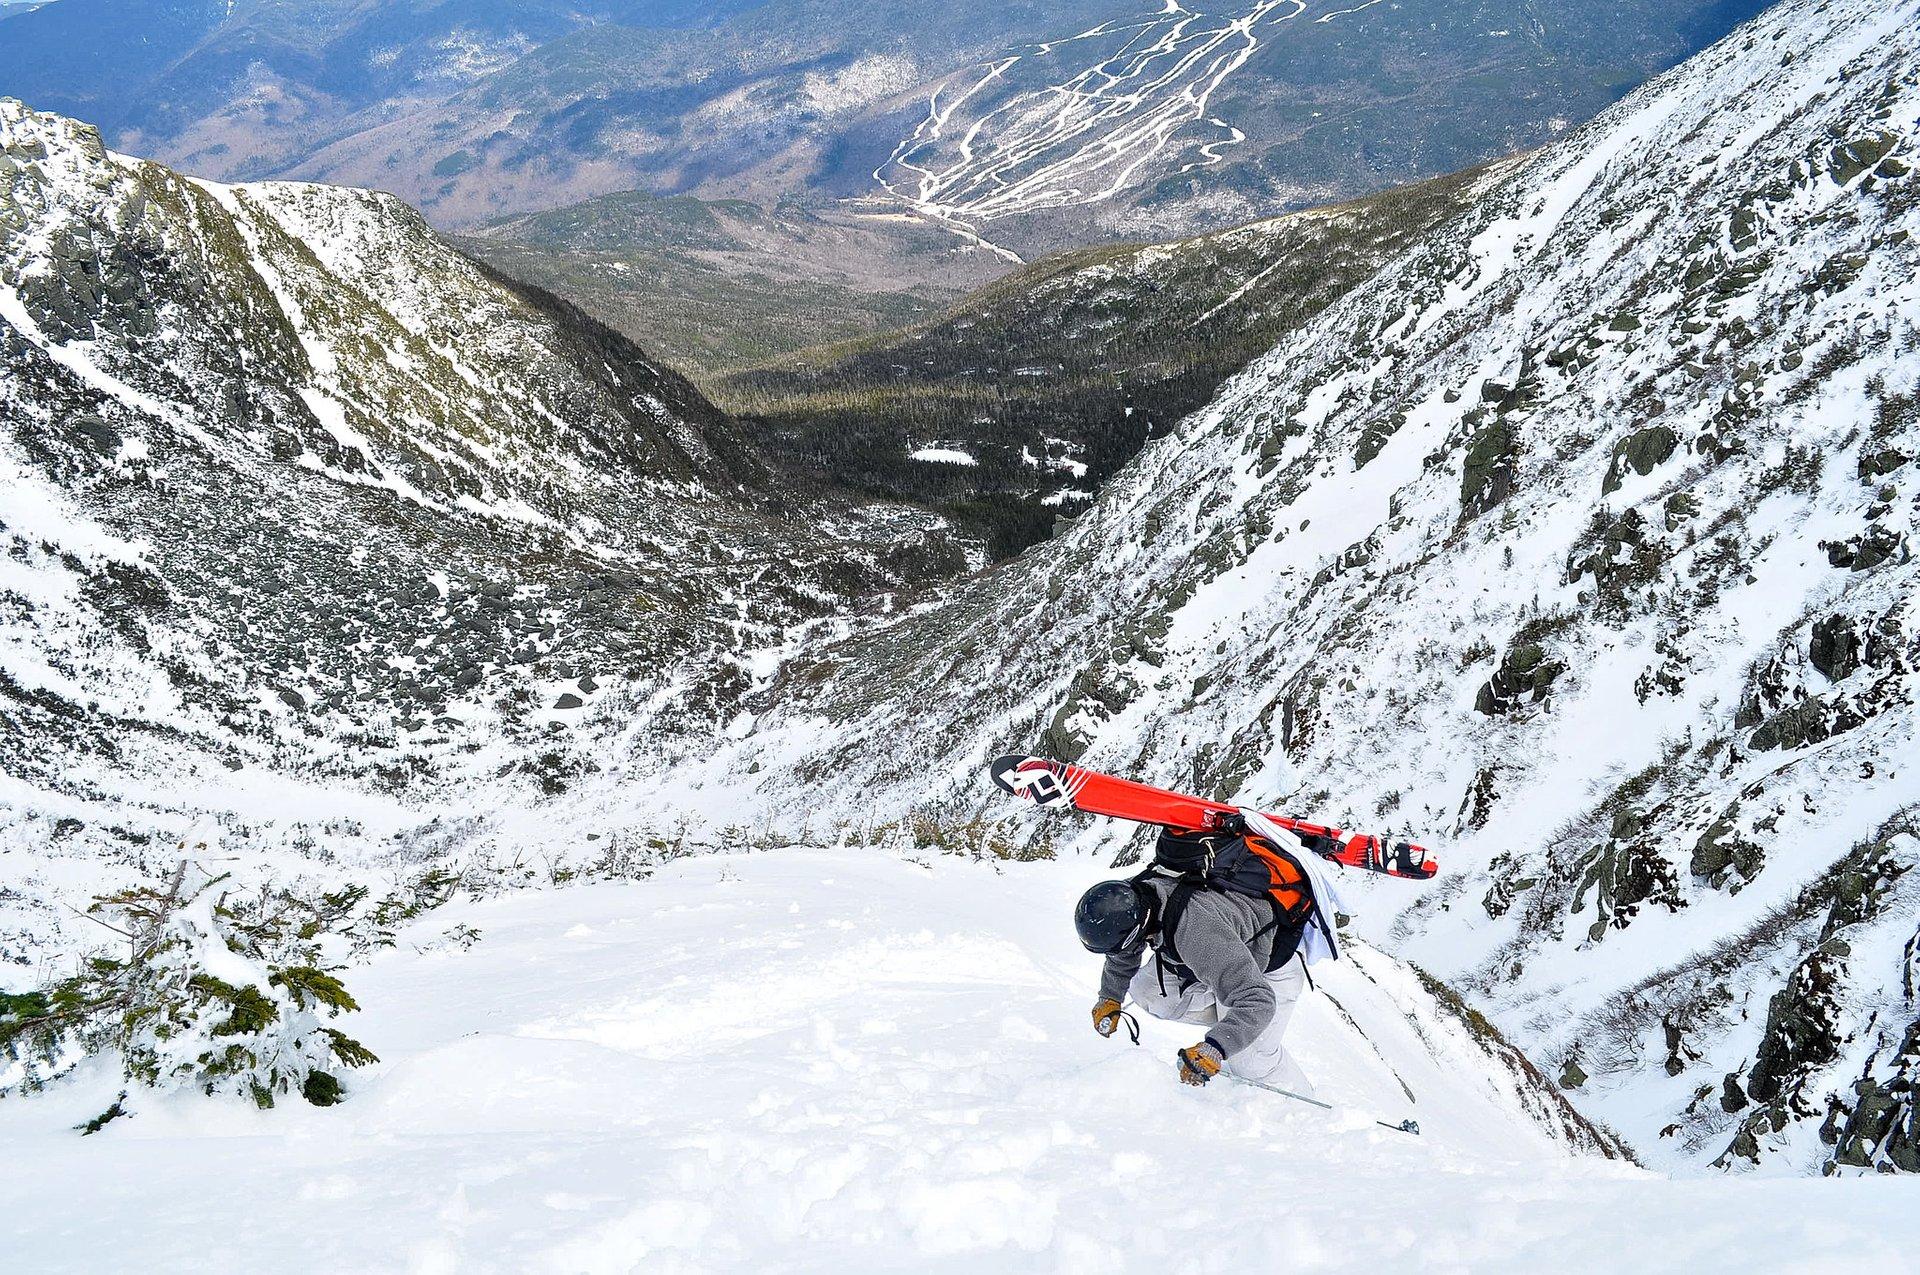 Skiing in Appalachian Mountains